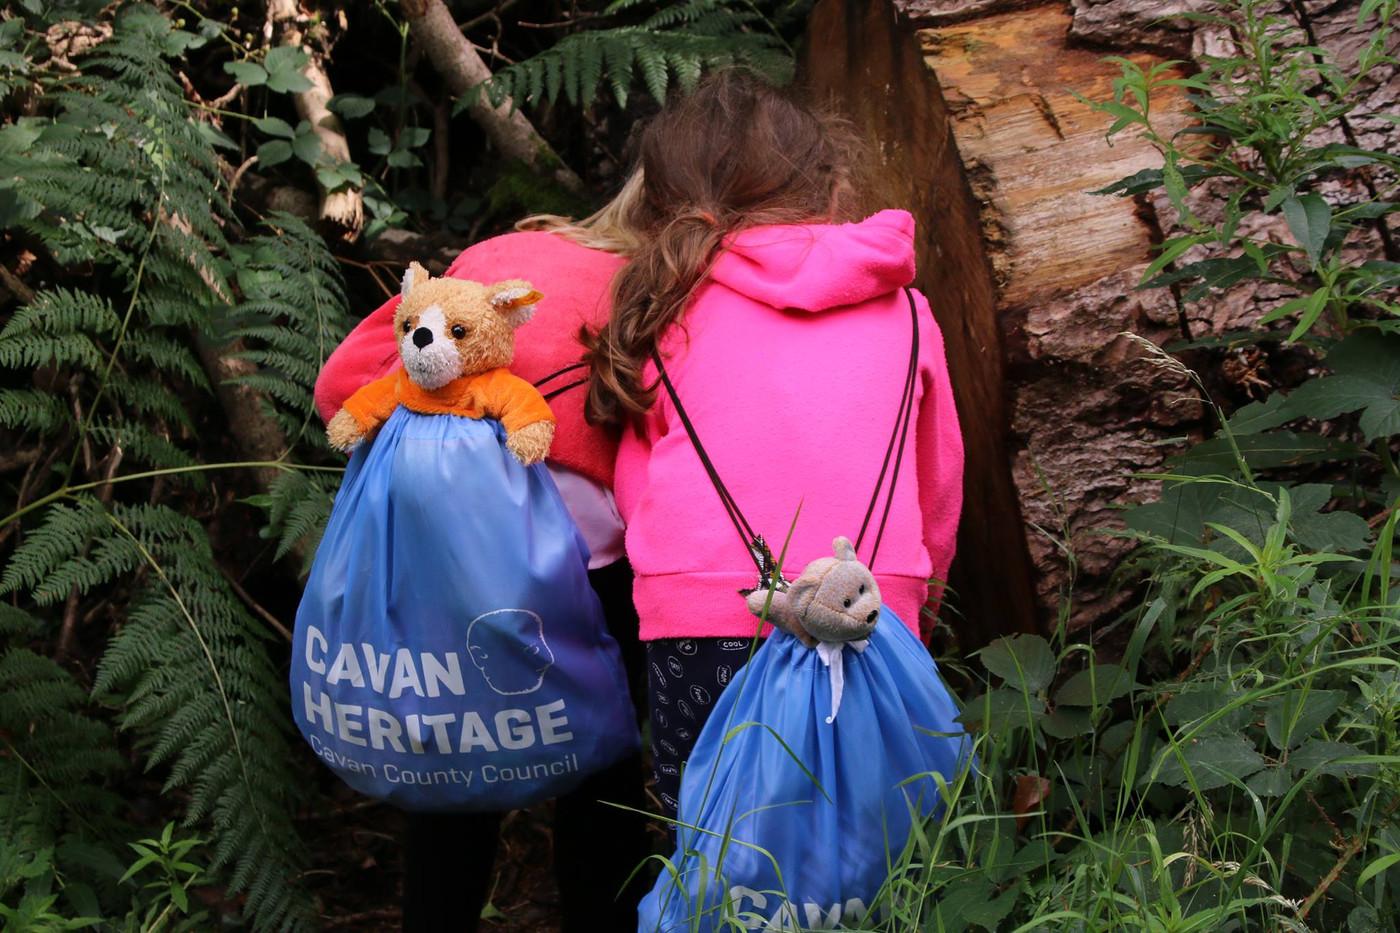 Explore Cavan